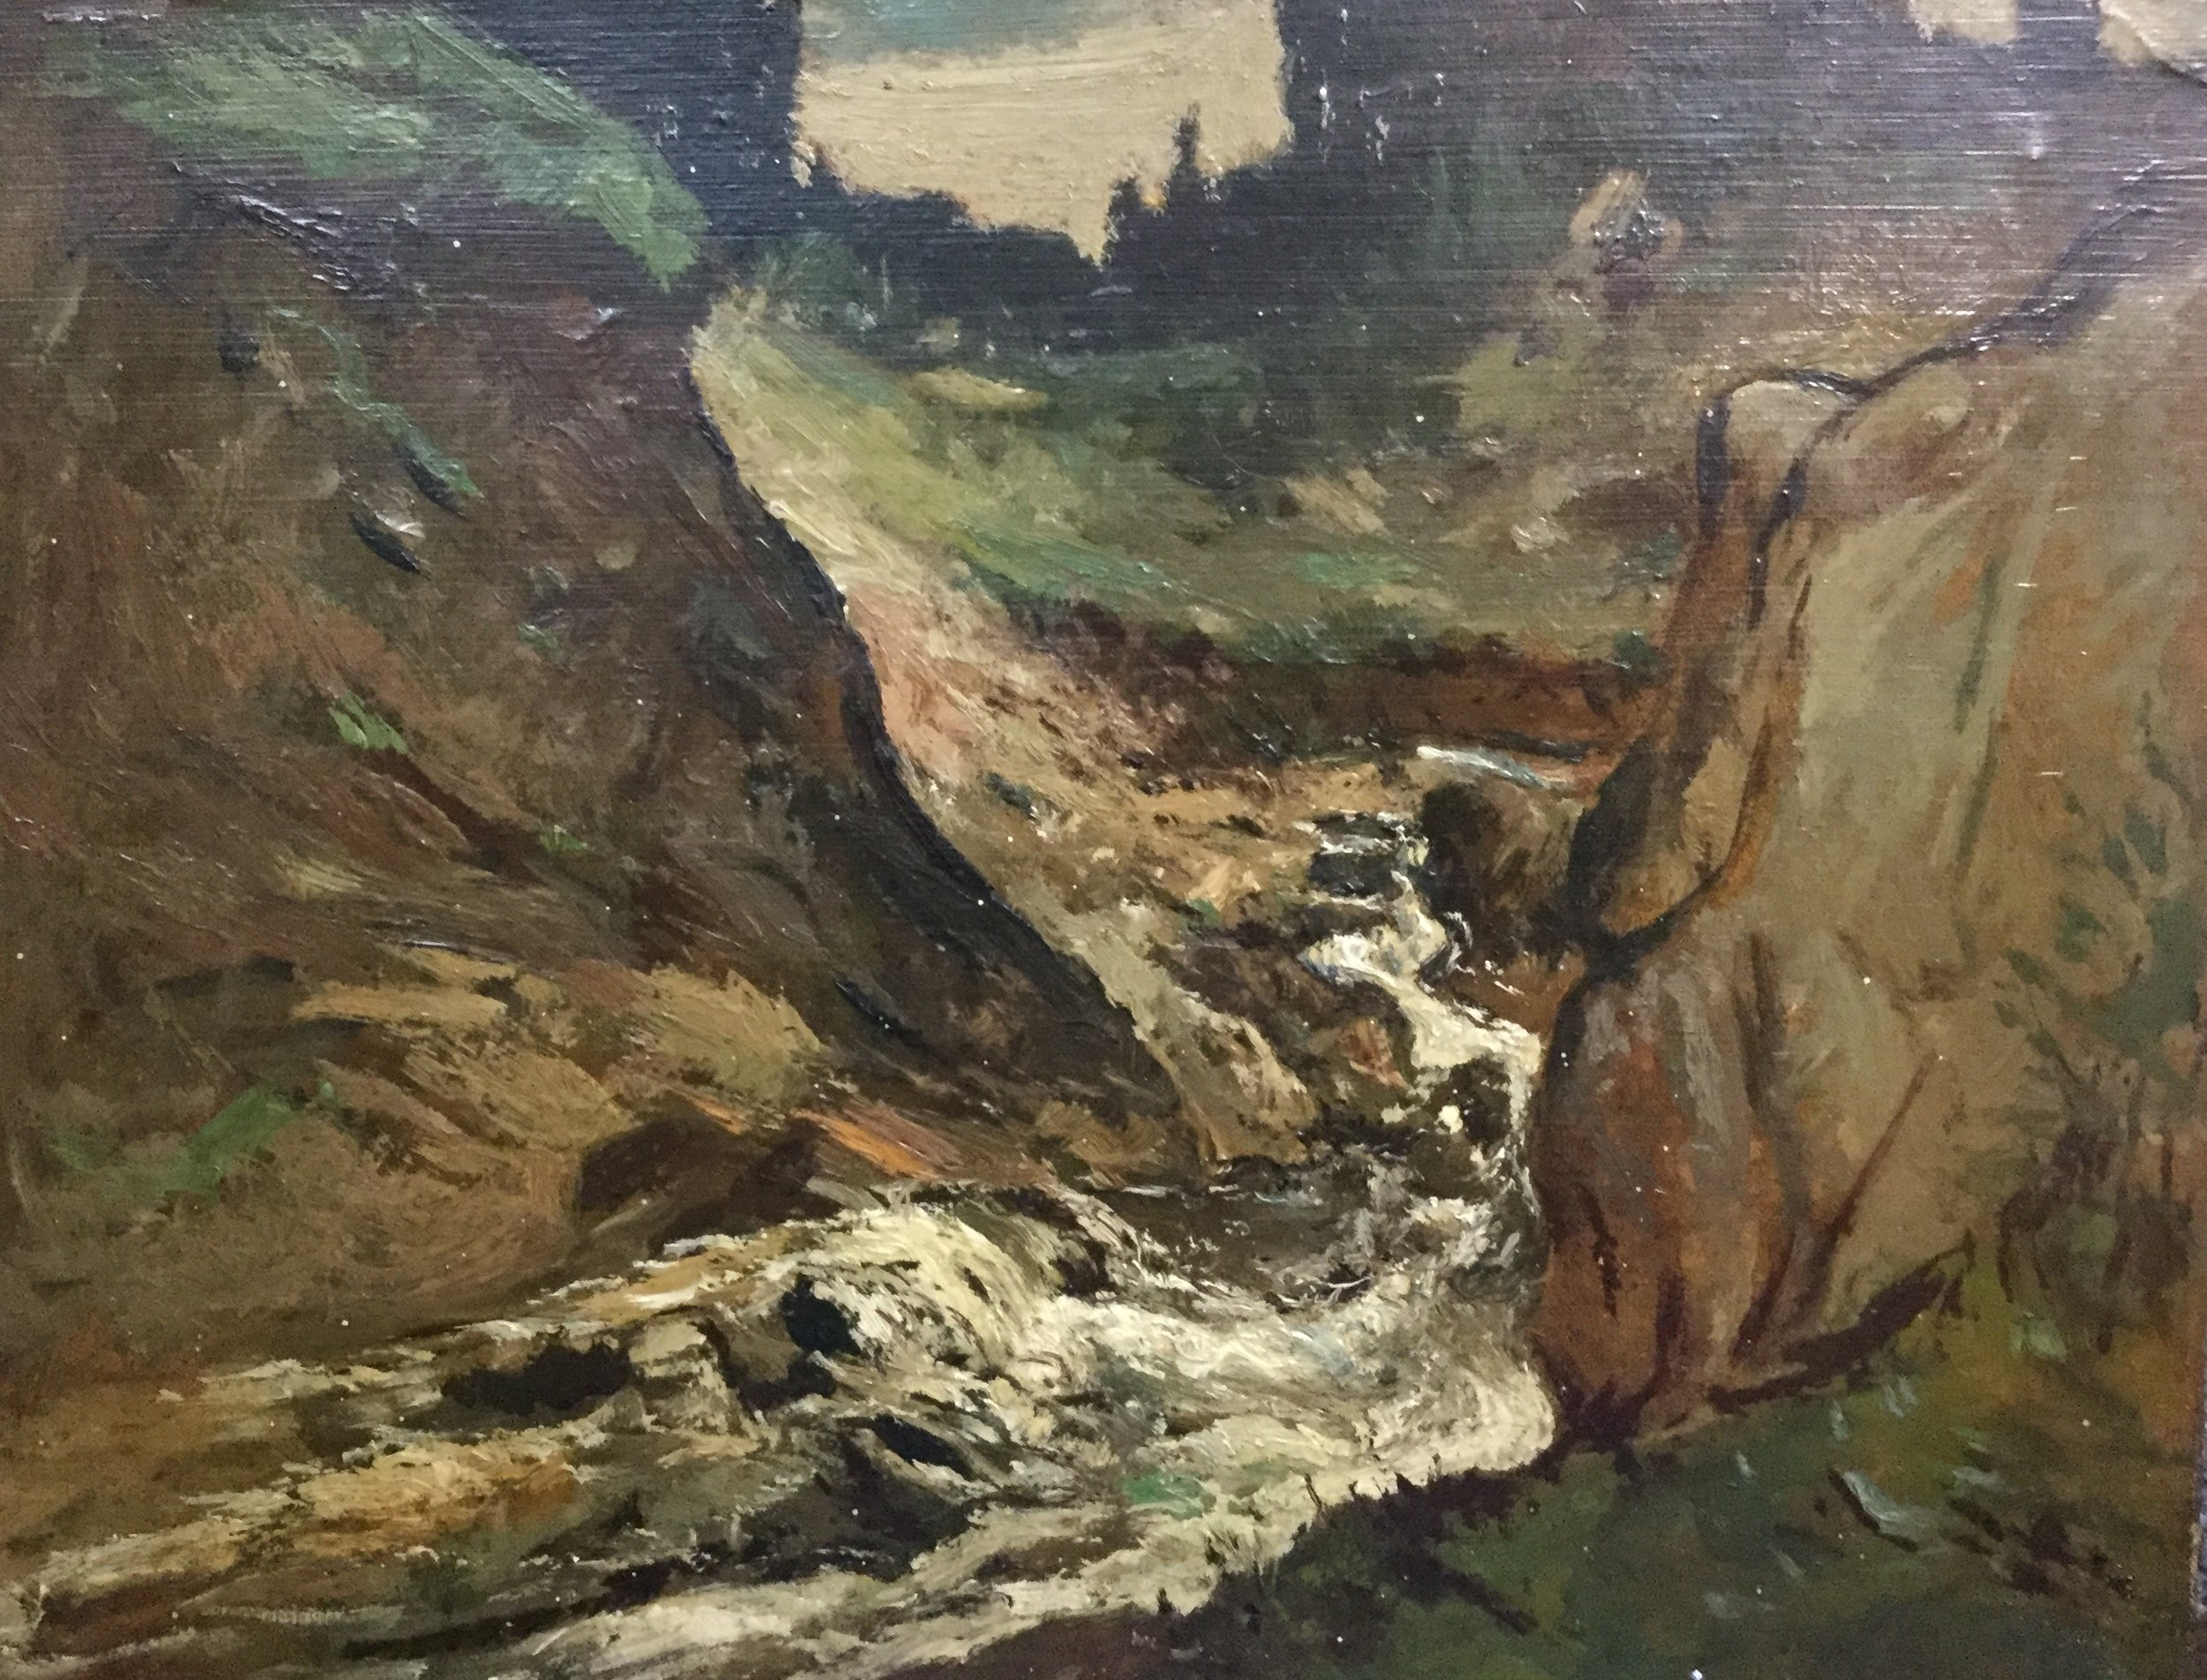 Raging River *